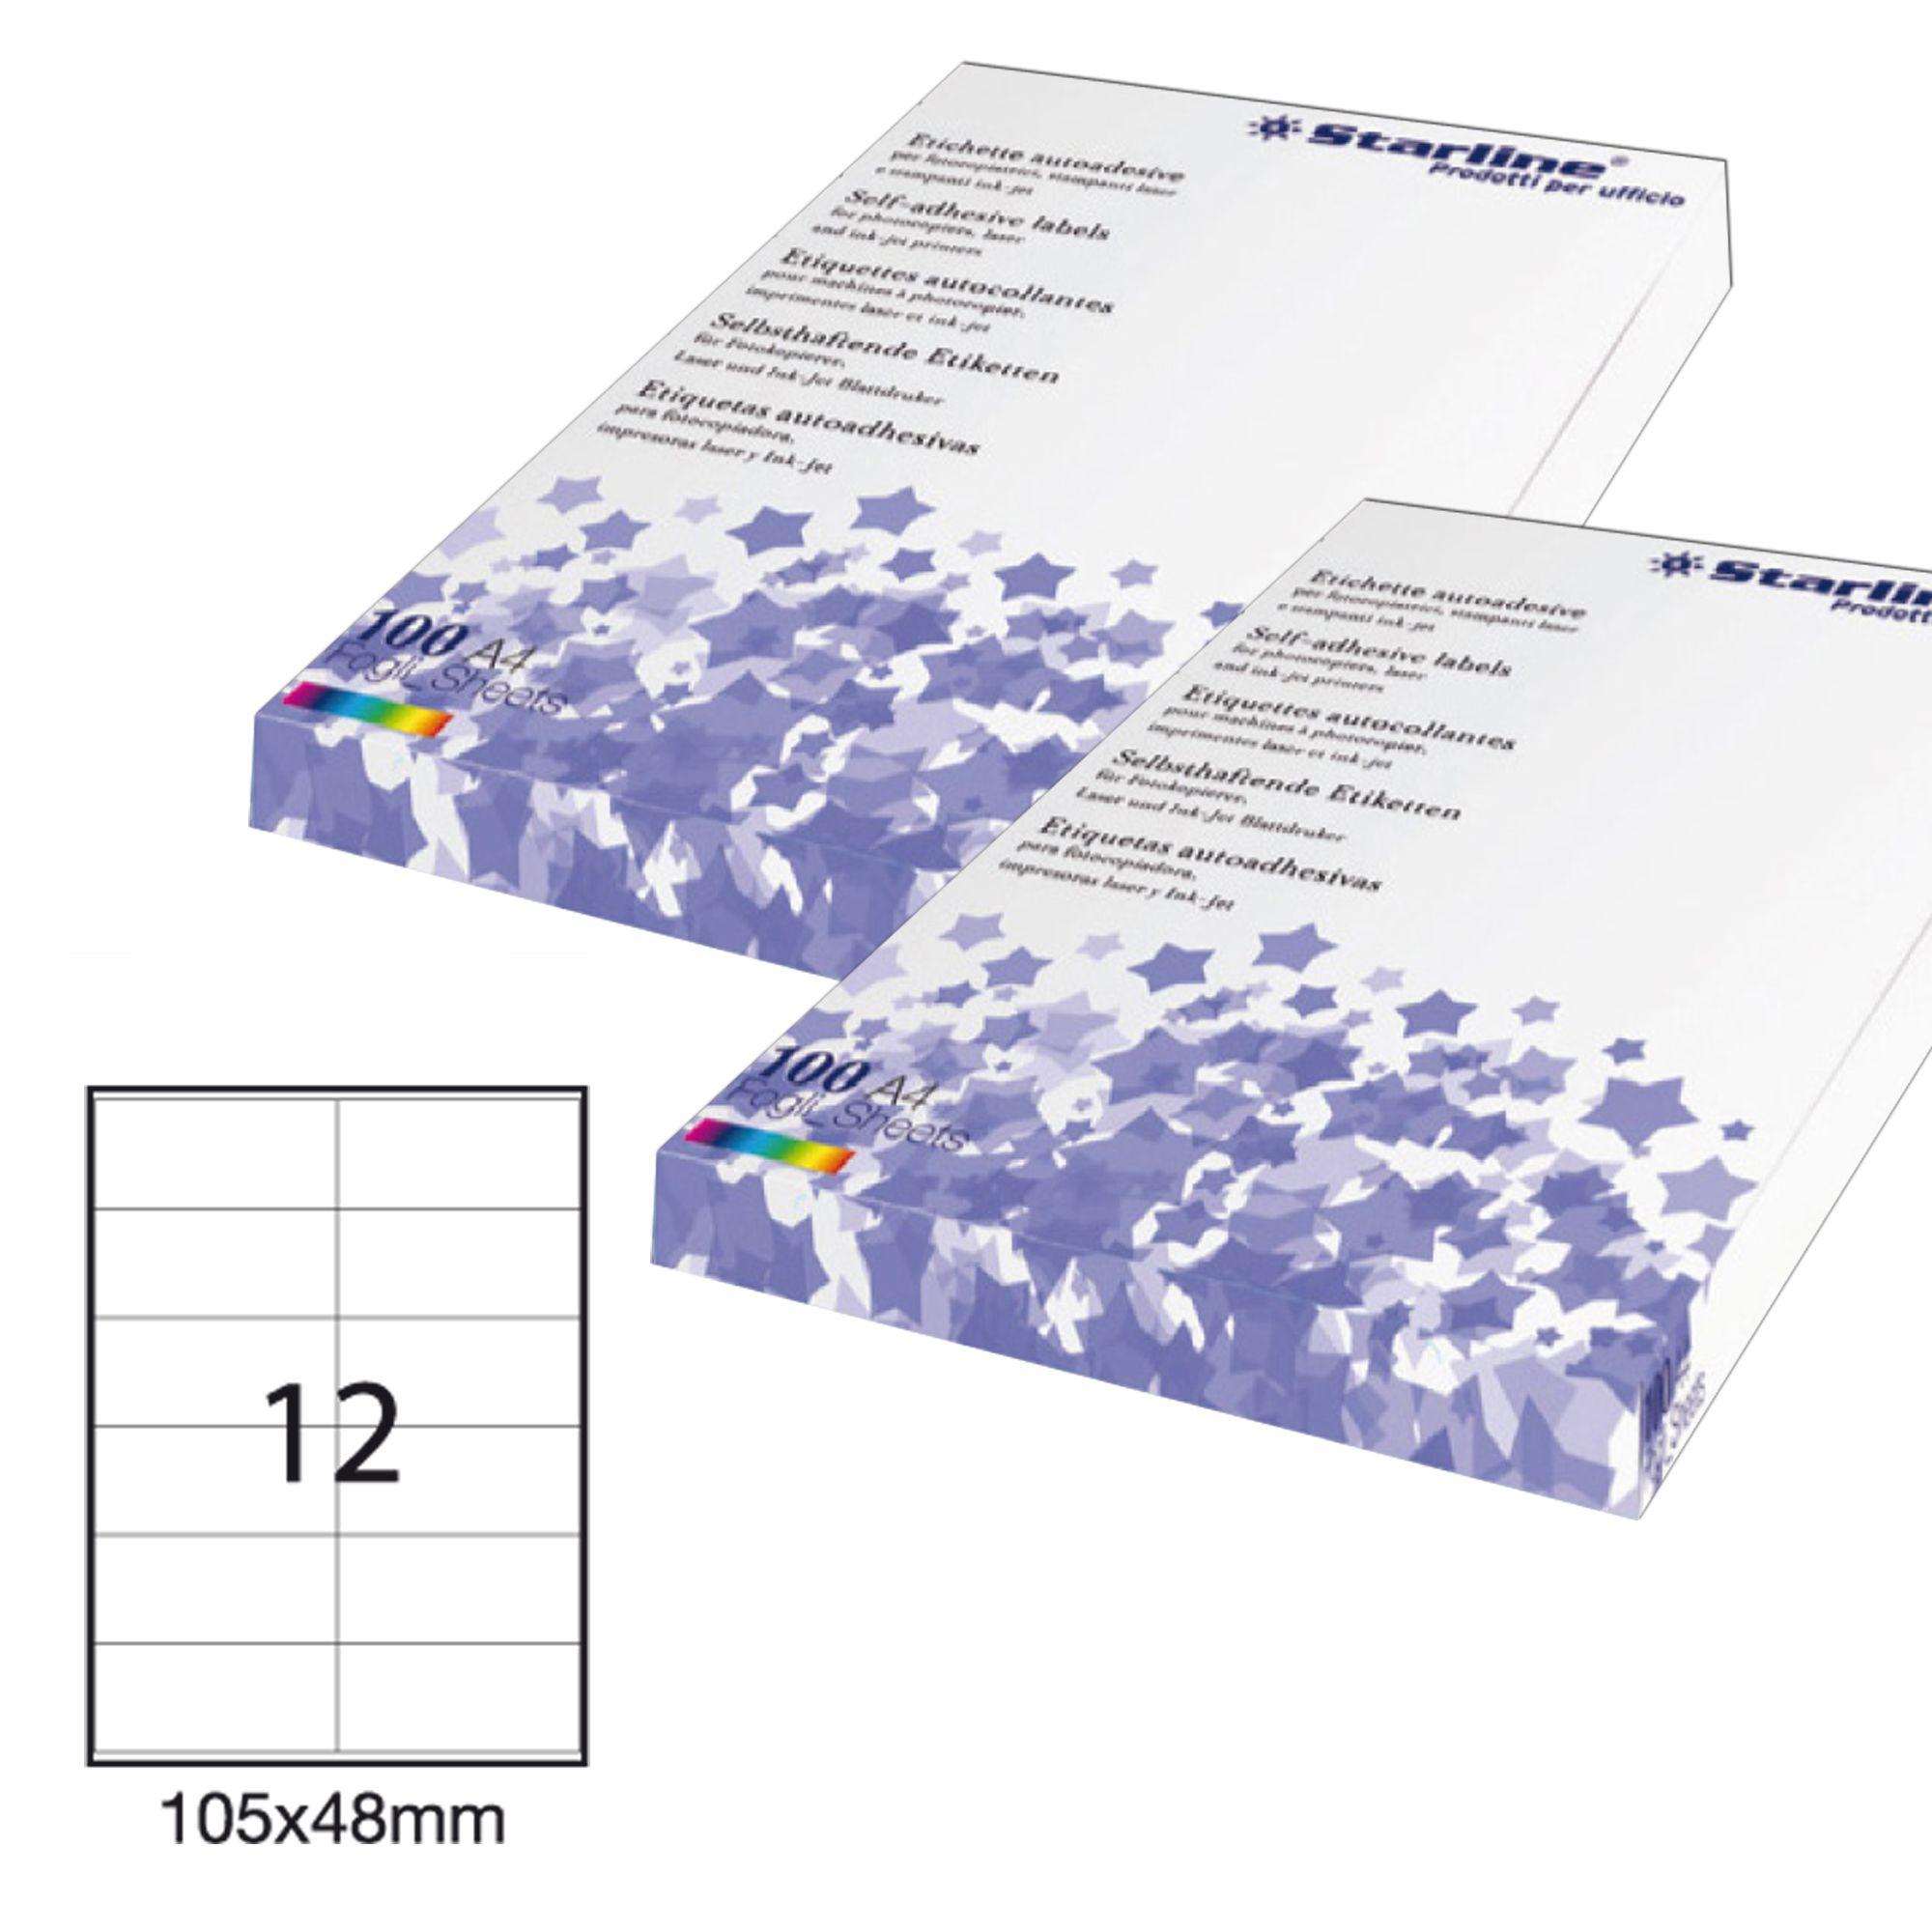 STARLINE etichetta adesiva bianca 100fg a4 starline 8 et. 105x74mm